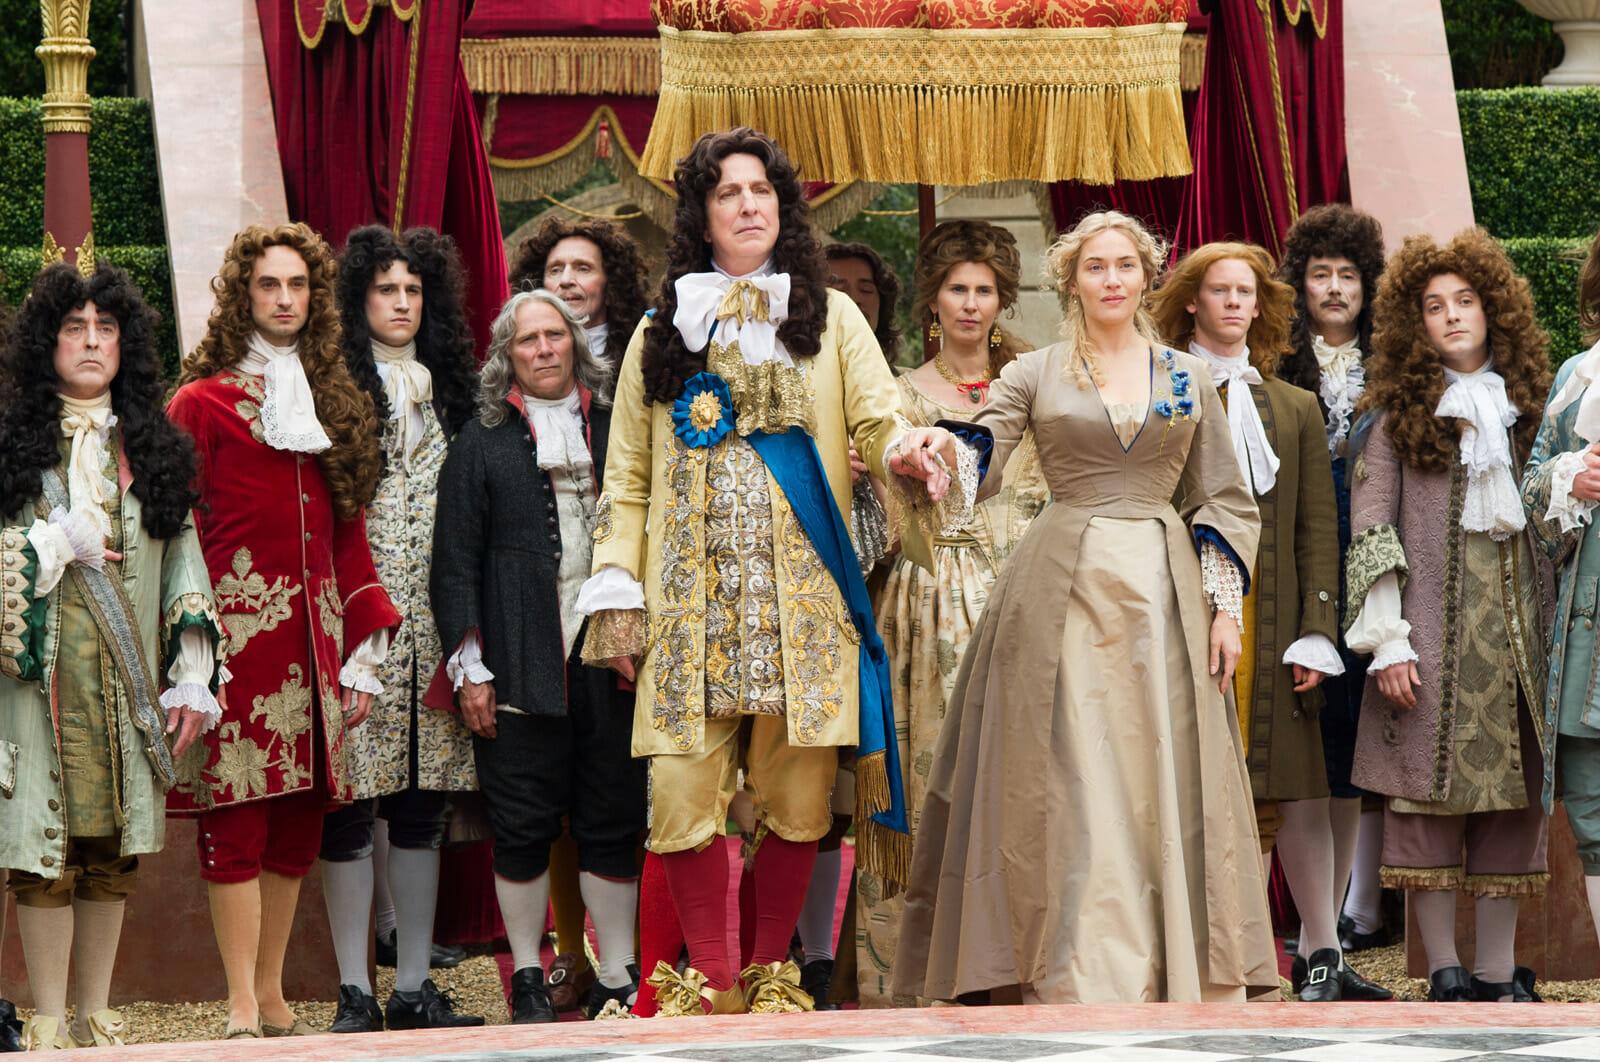 Les-Jardins-du-Roi-Kate-Winslet-Alan-Rickman